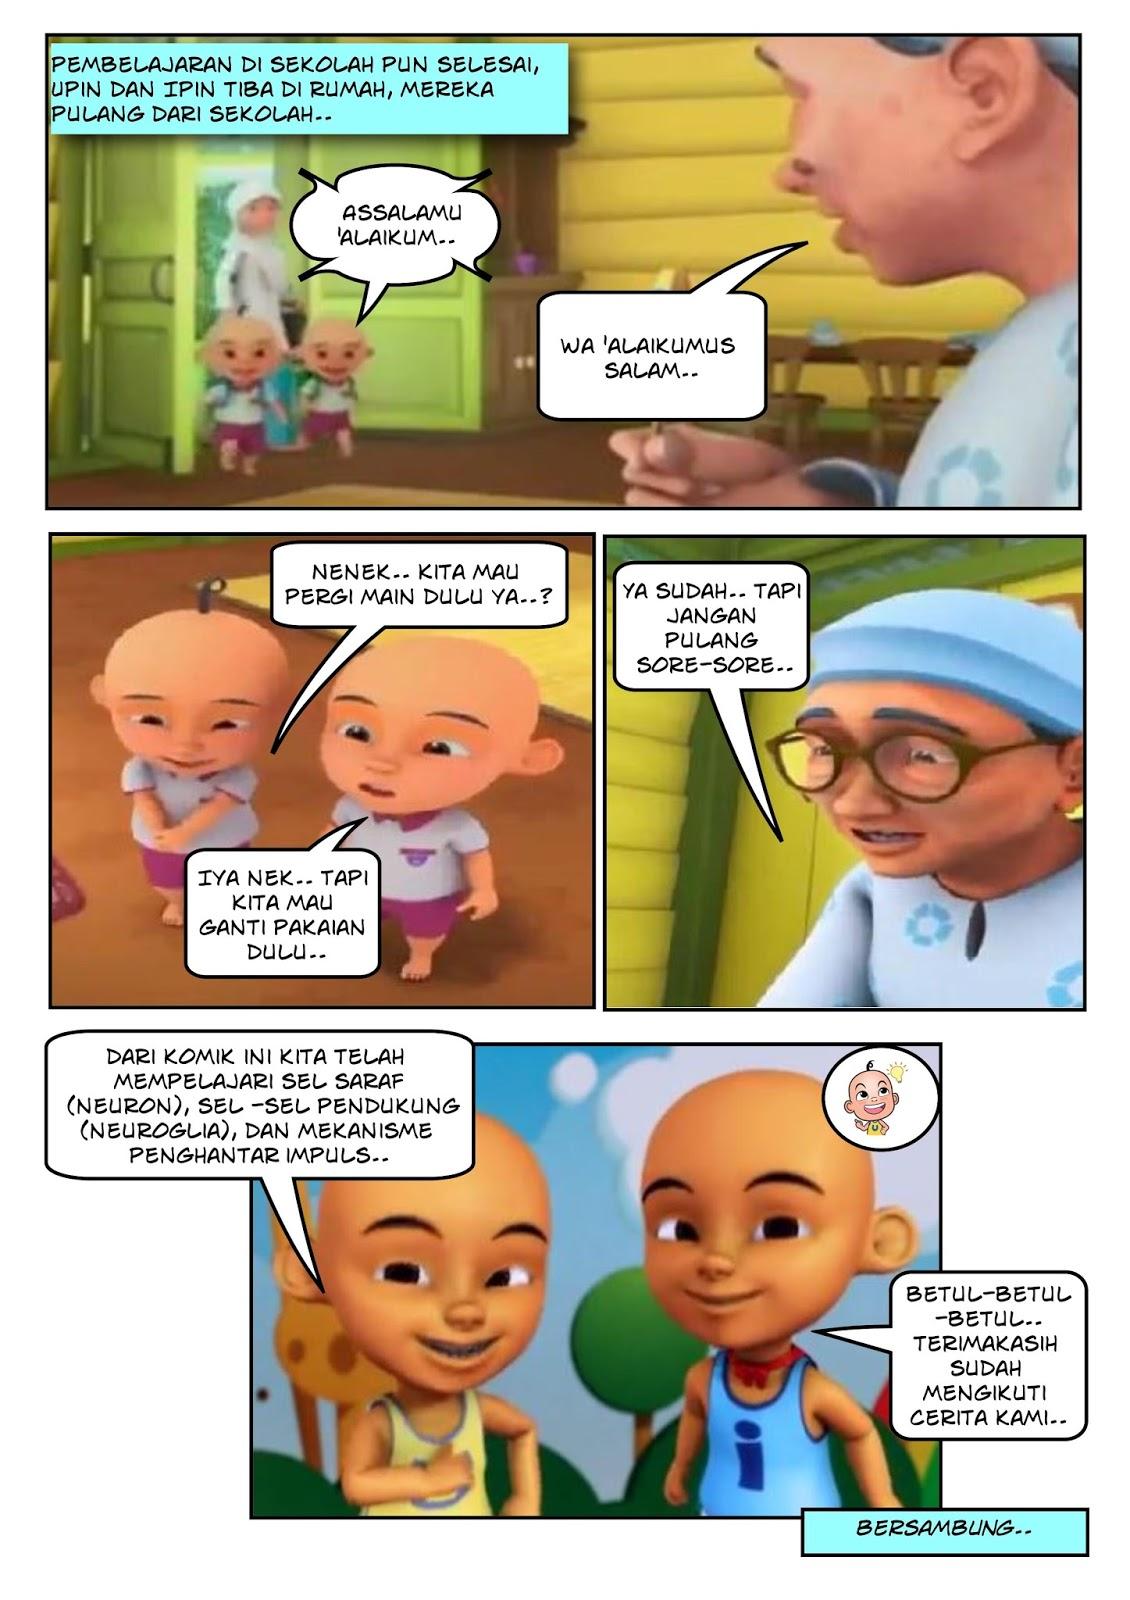 Gambar Komik Lucu Upin Ipin Komicbox